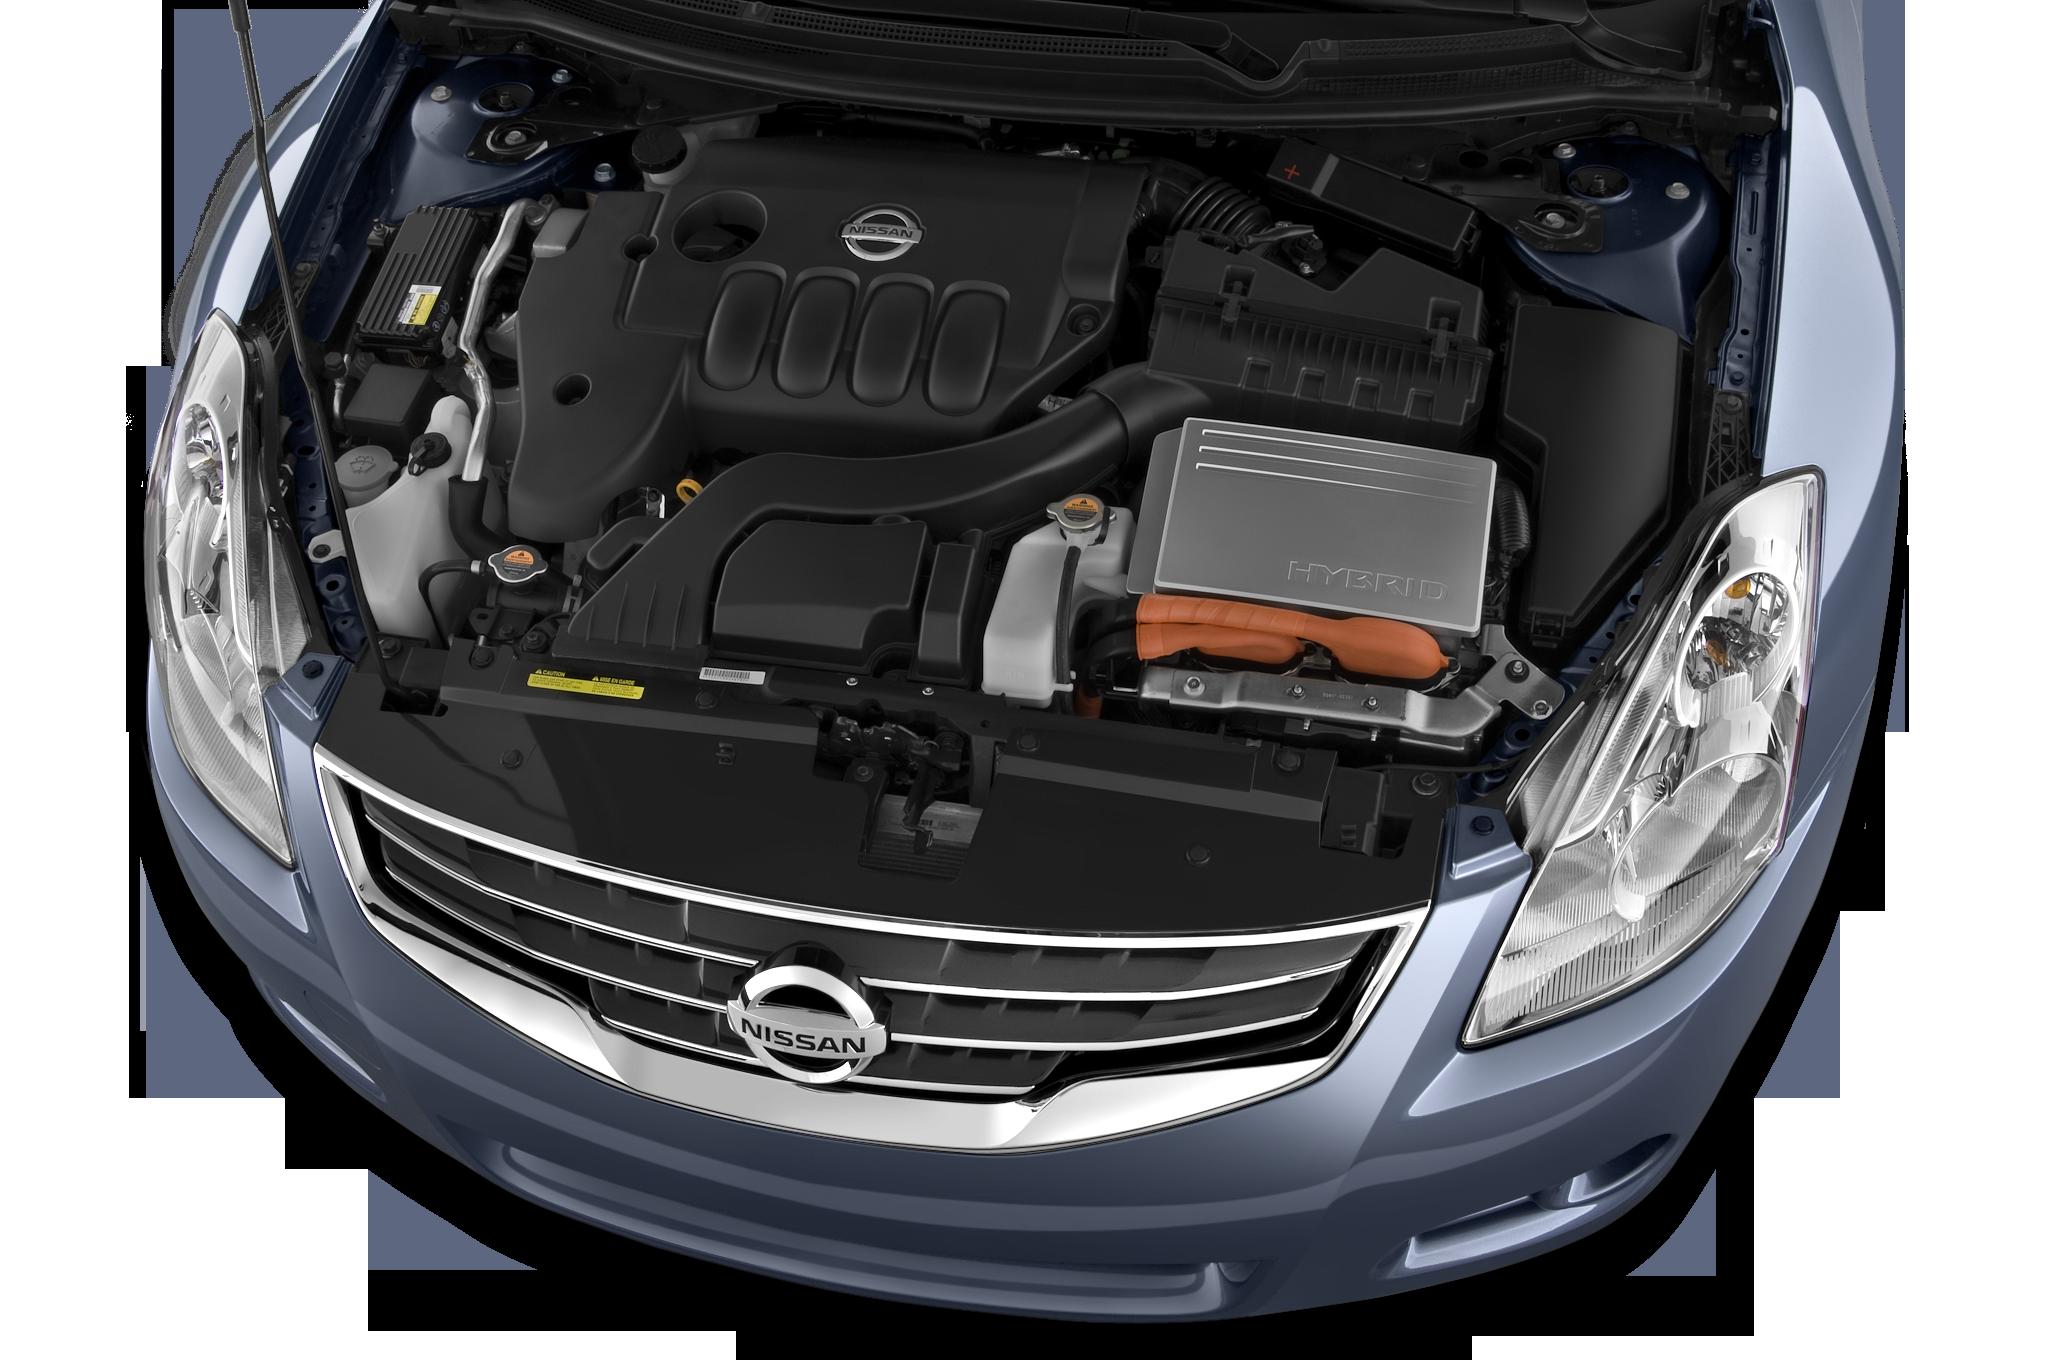 2010 Nissan Altima 35 Sr Midsize Sedan Review Automobile Engine Diagram 34 75